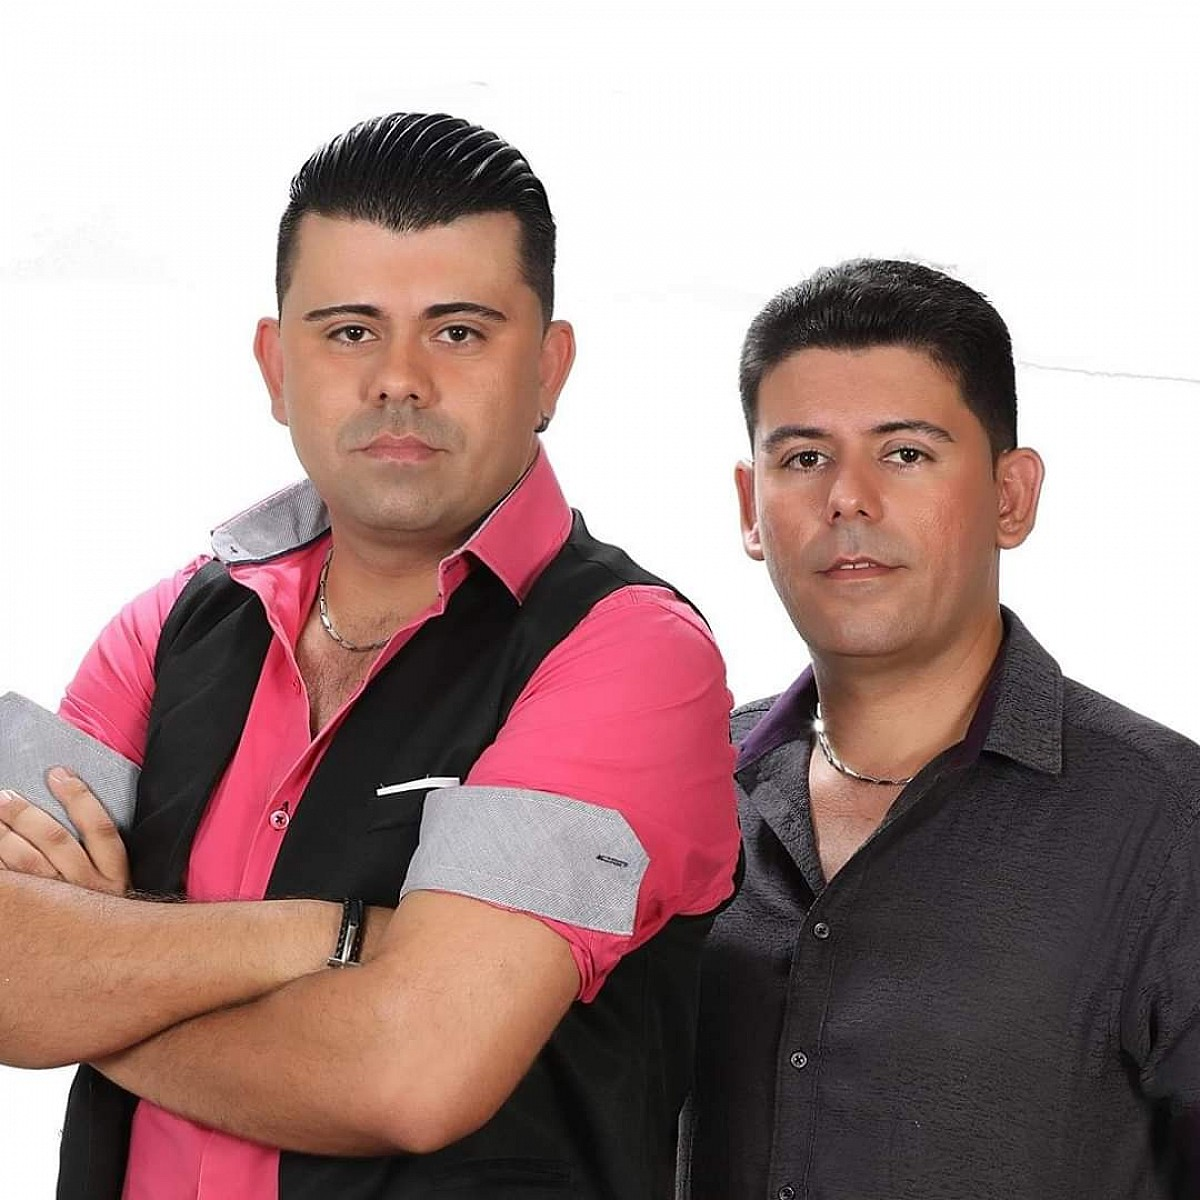 Dupla avareense participa de programa de TV em Brasília